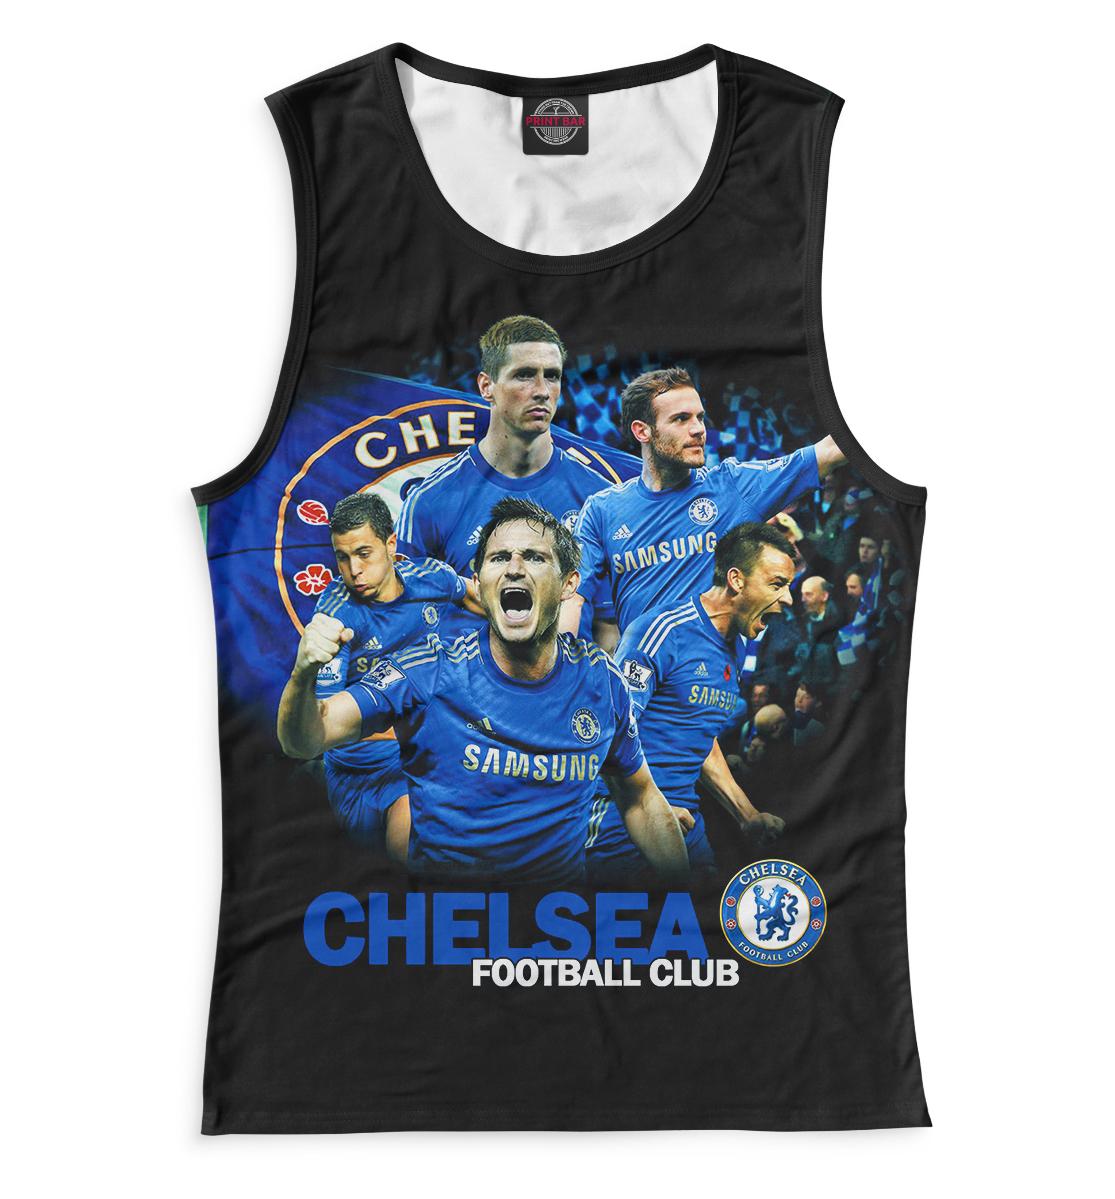 Купить Майка для девочки Chelsea CHL-889686-may-1